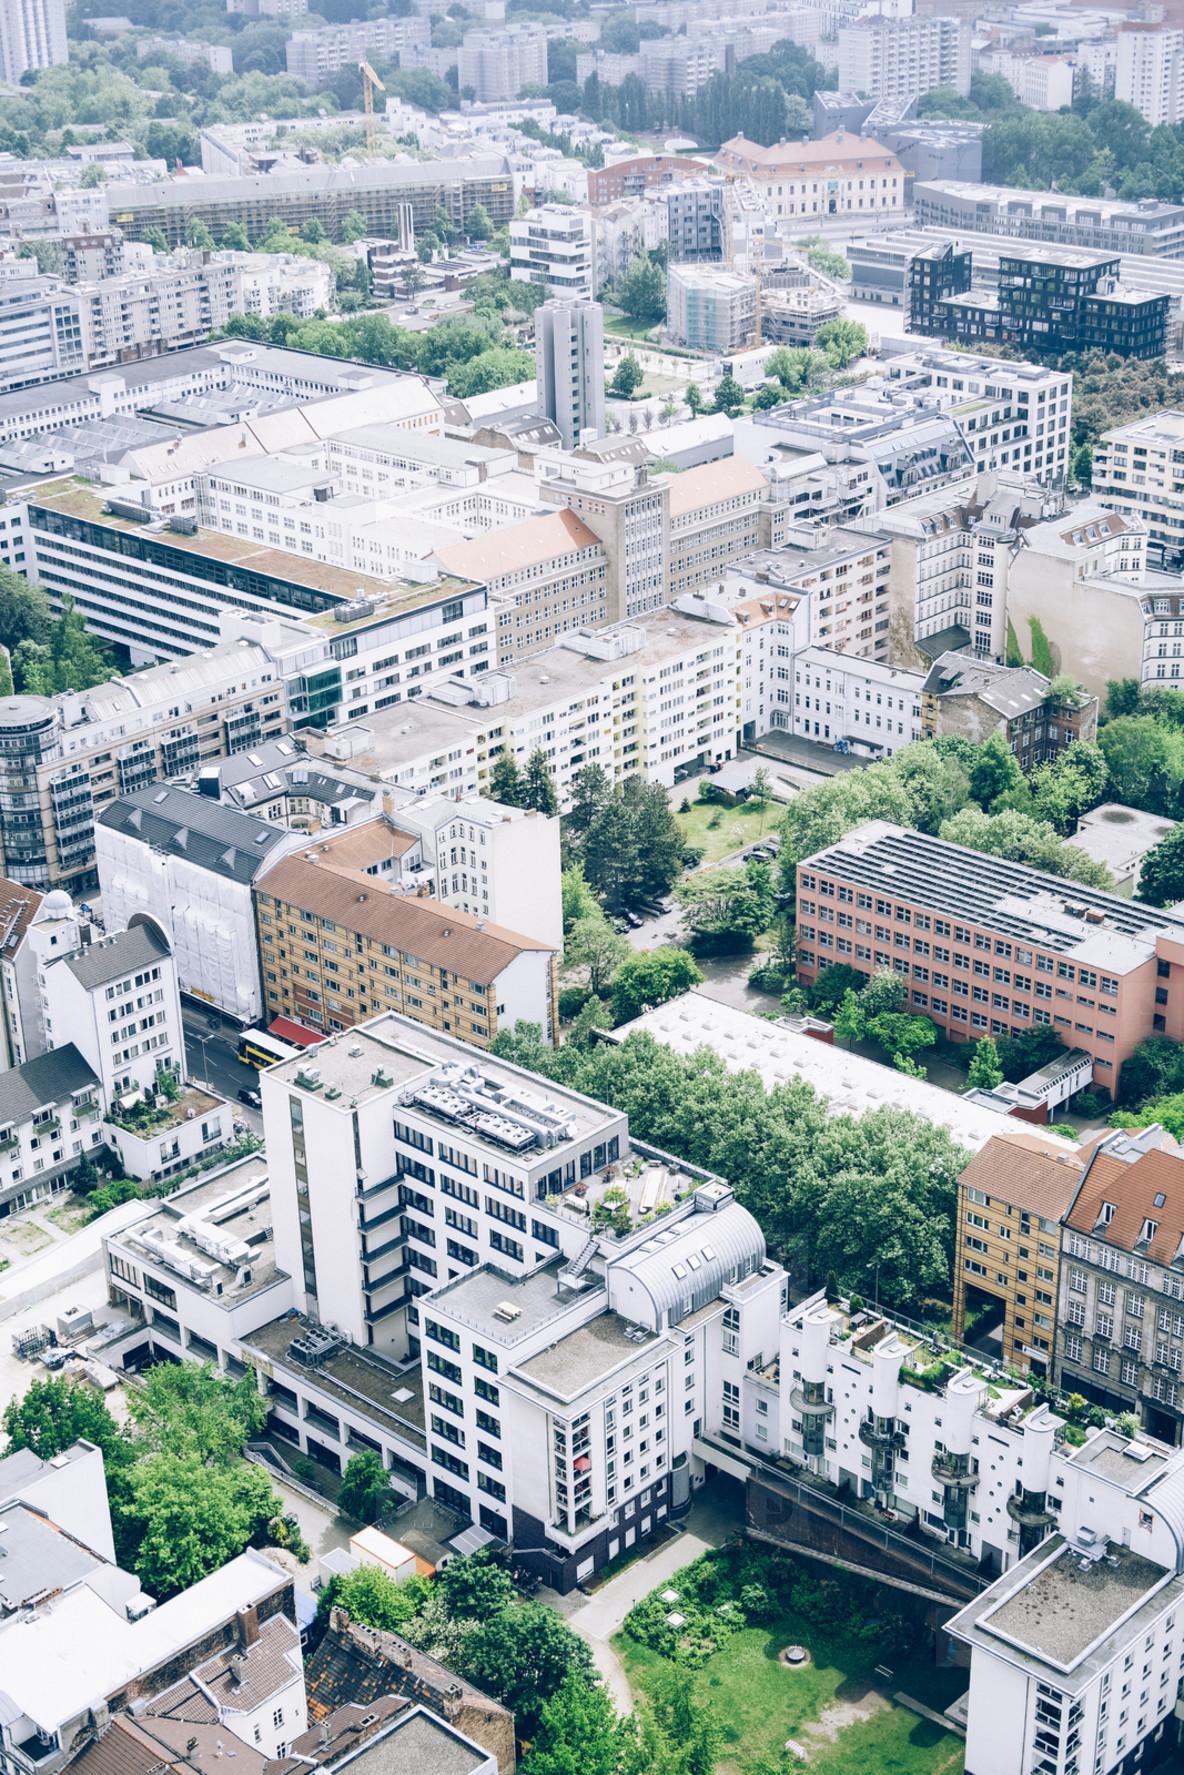 Kapital City of Germany Berlin